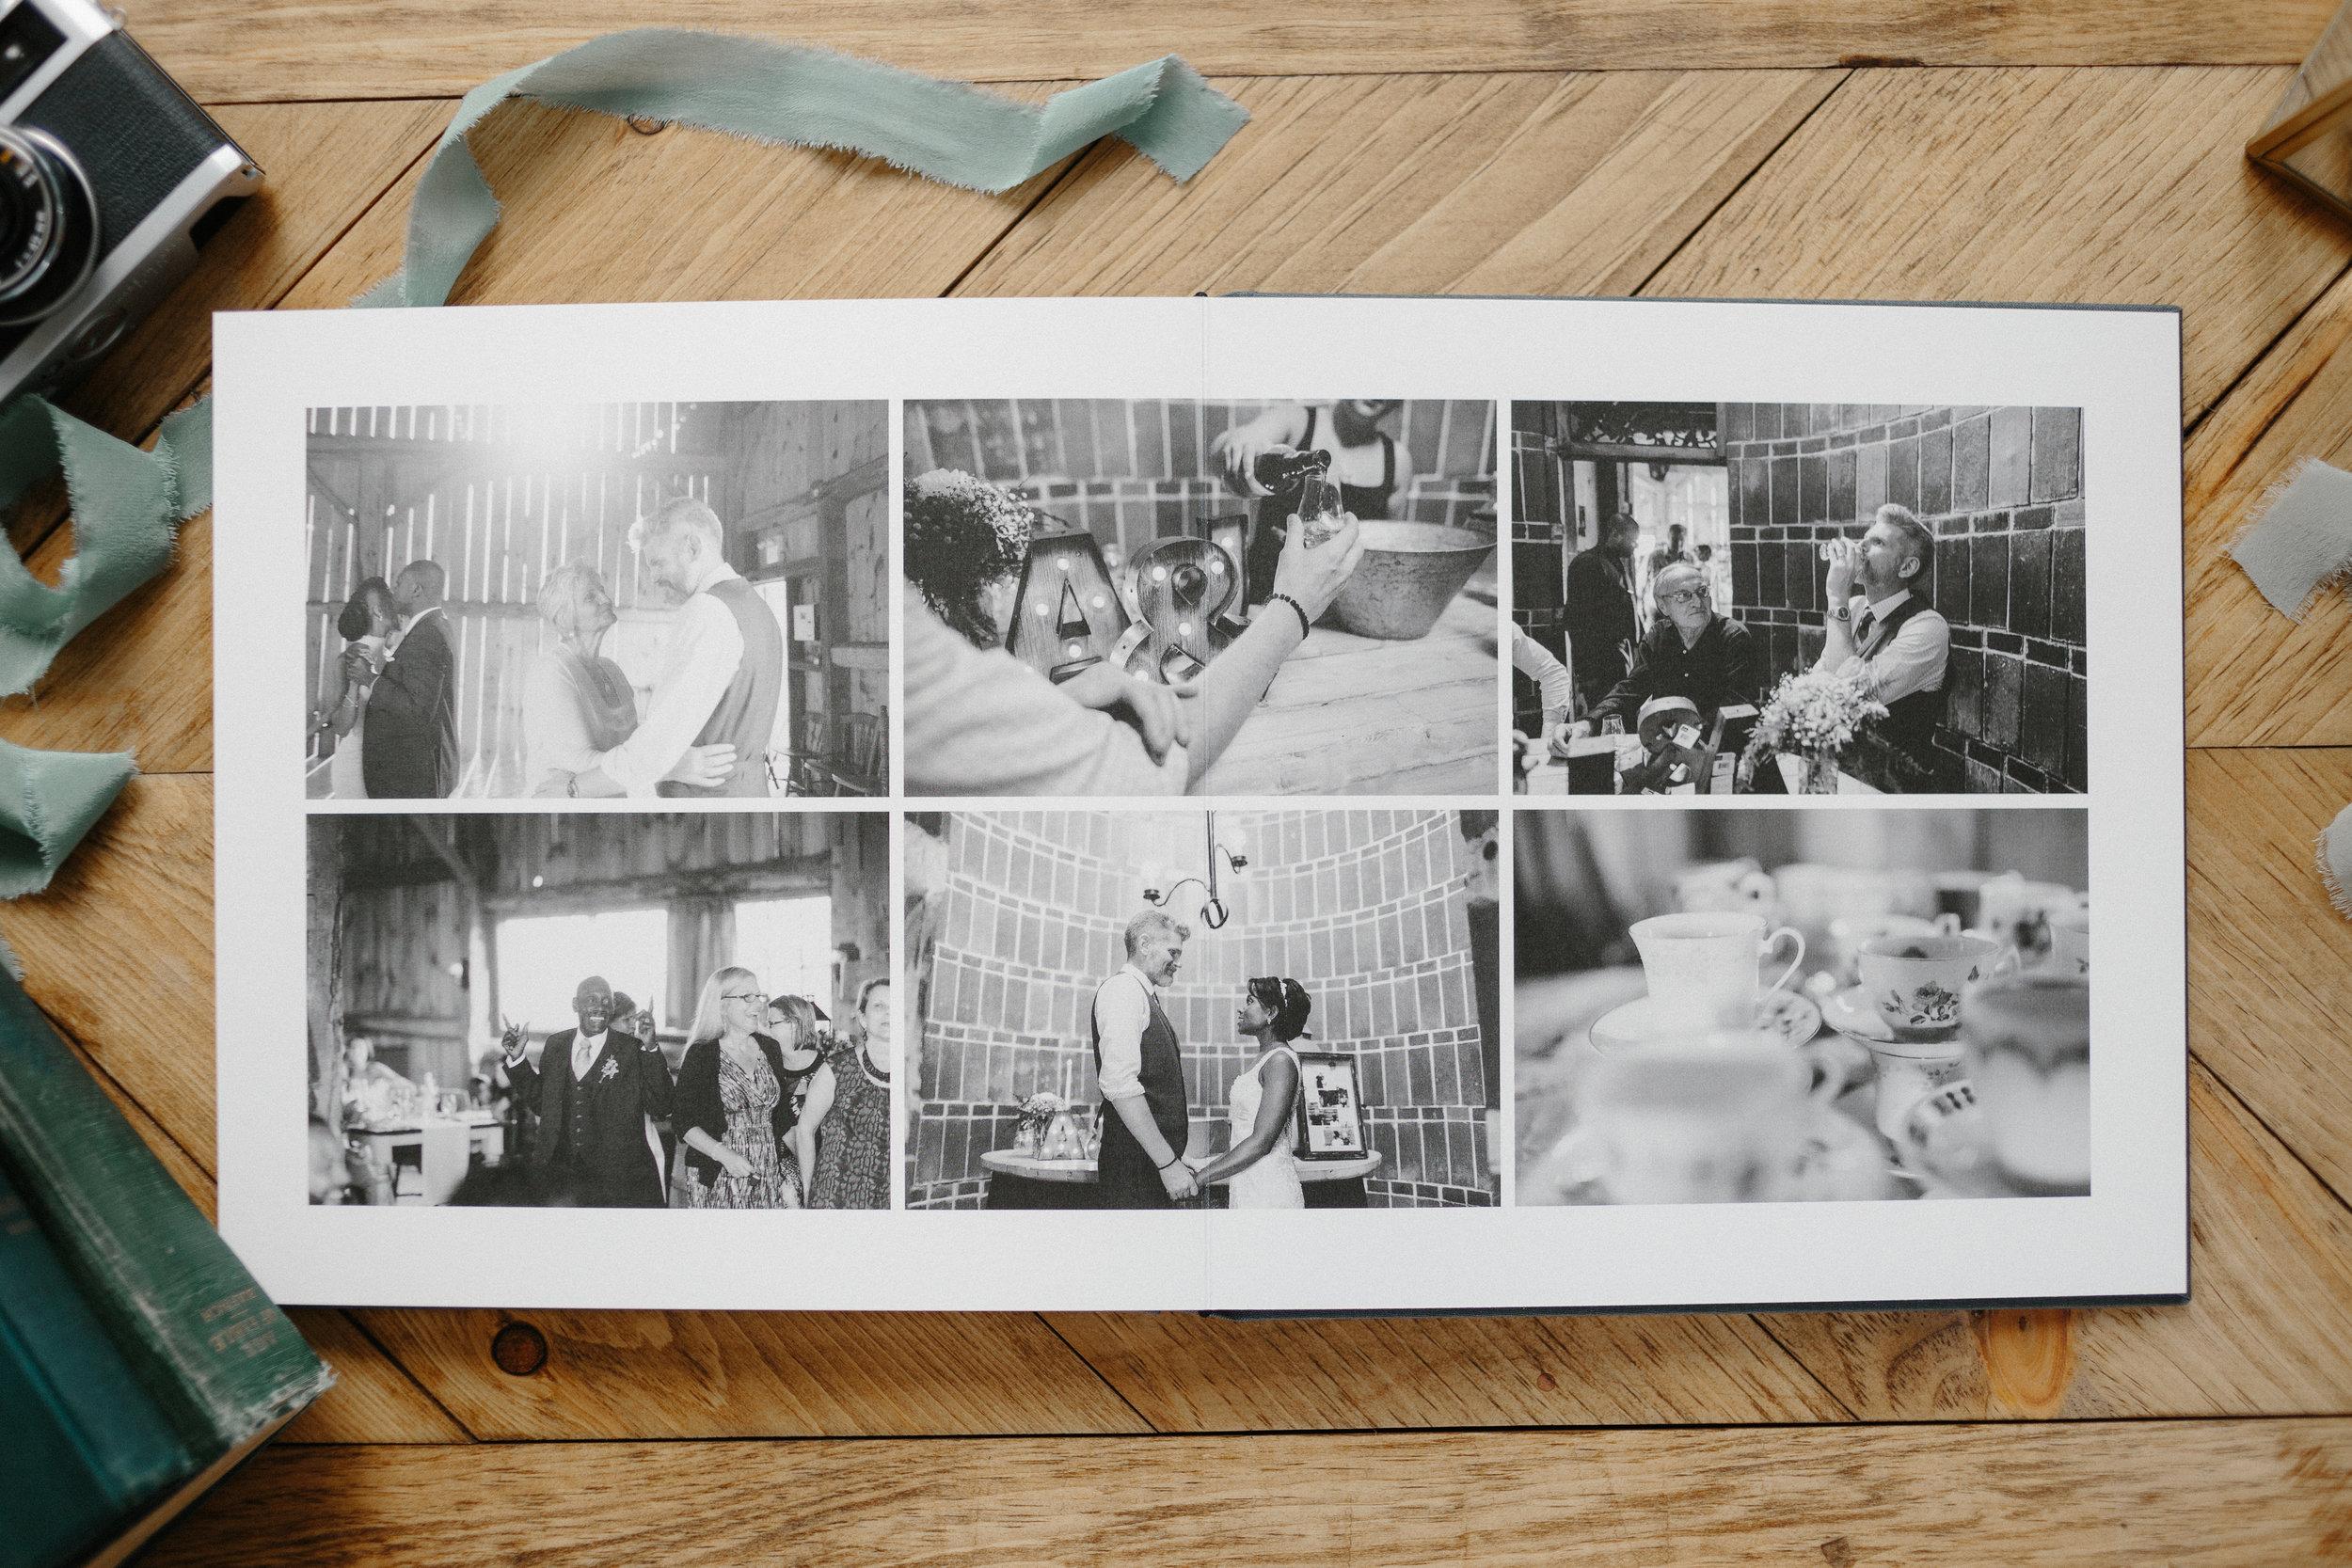 ryanne-hollies-photography-wedding-album-design-details-tono-and-co-artifact-uprising-67.jpg